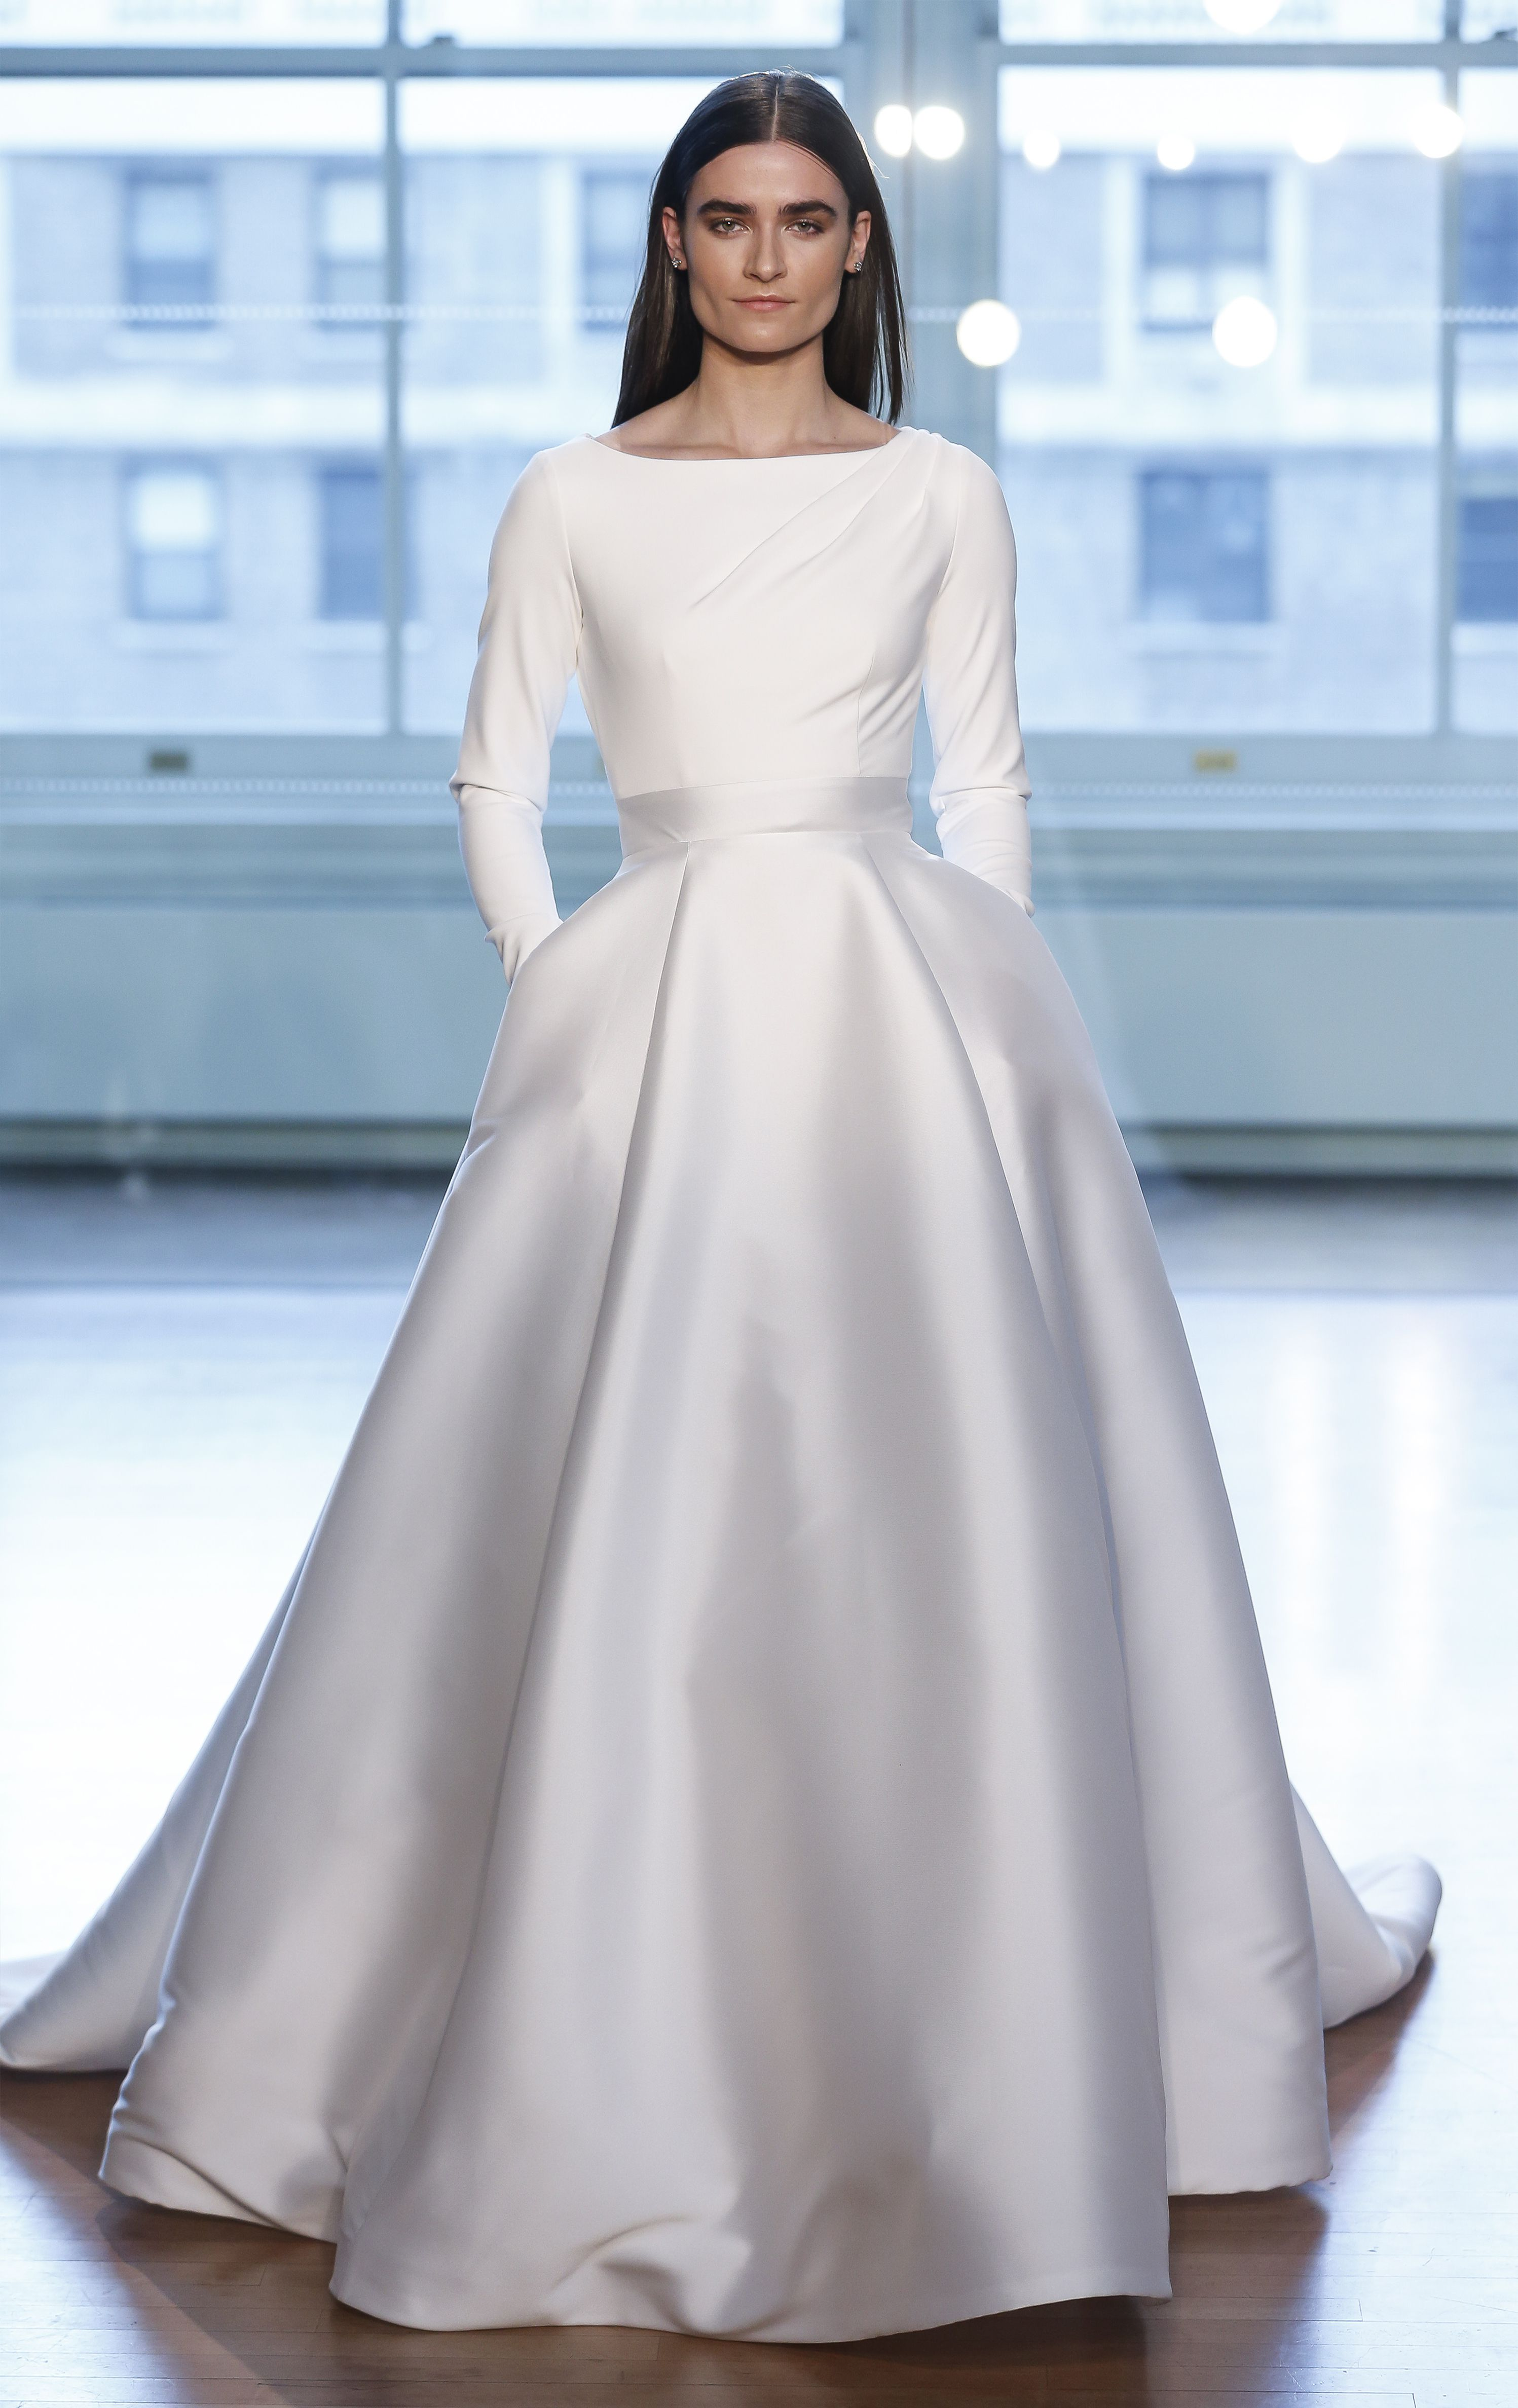 meghan markle s wedding dress unveiled justin alexander meghan markle s wedding dress unveiled